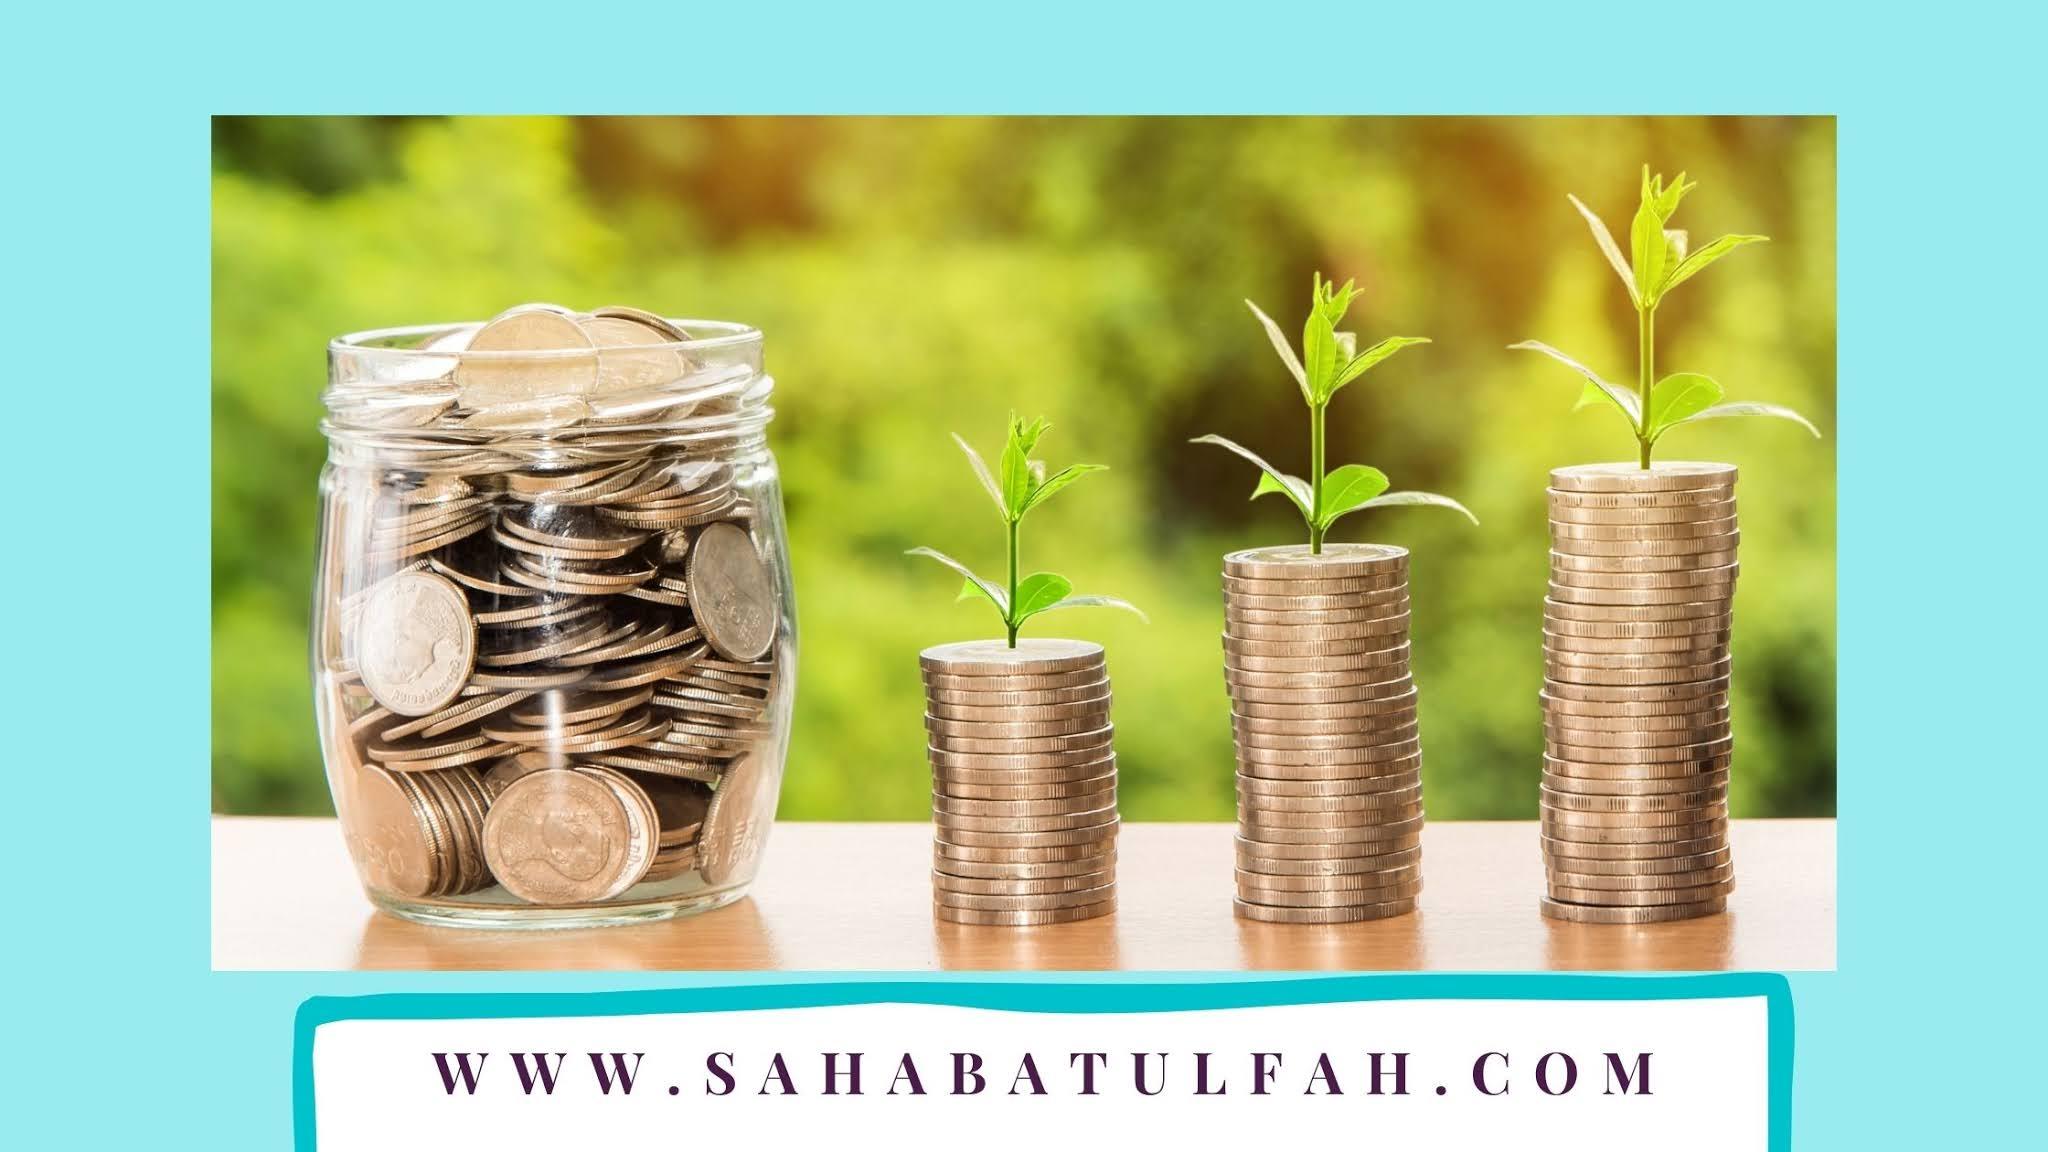 3-Tips-Alokasikan-THR-Agar-Kondisi-Financial-Aman